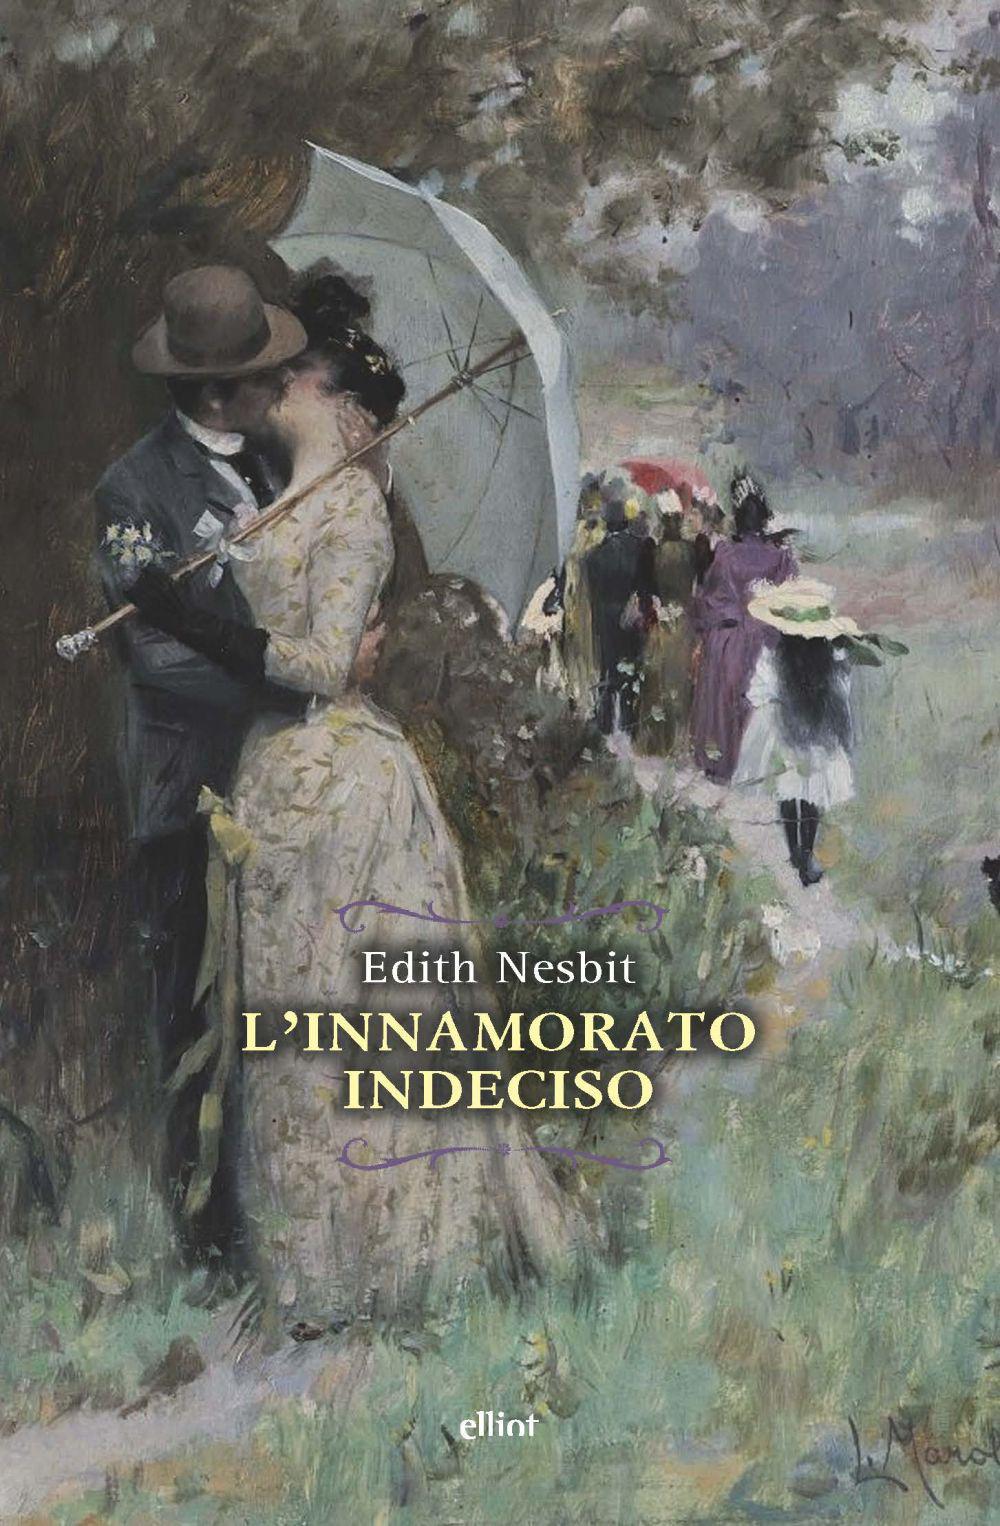 INNAMORATO INDECISO (L') - Nesbit Edith - 9788892760615